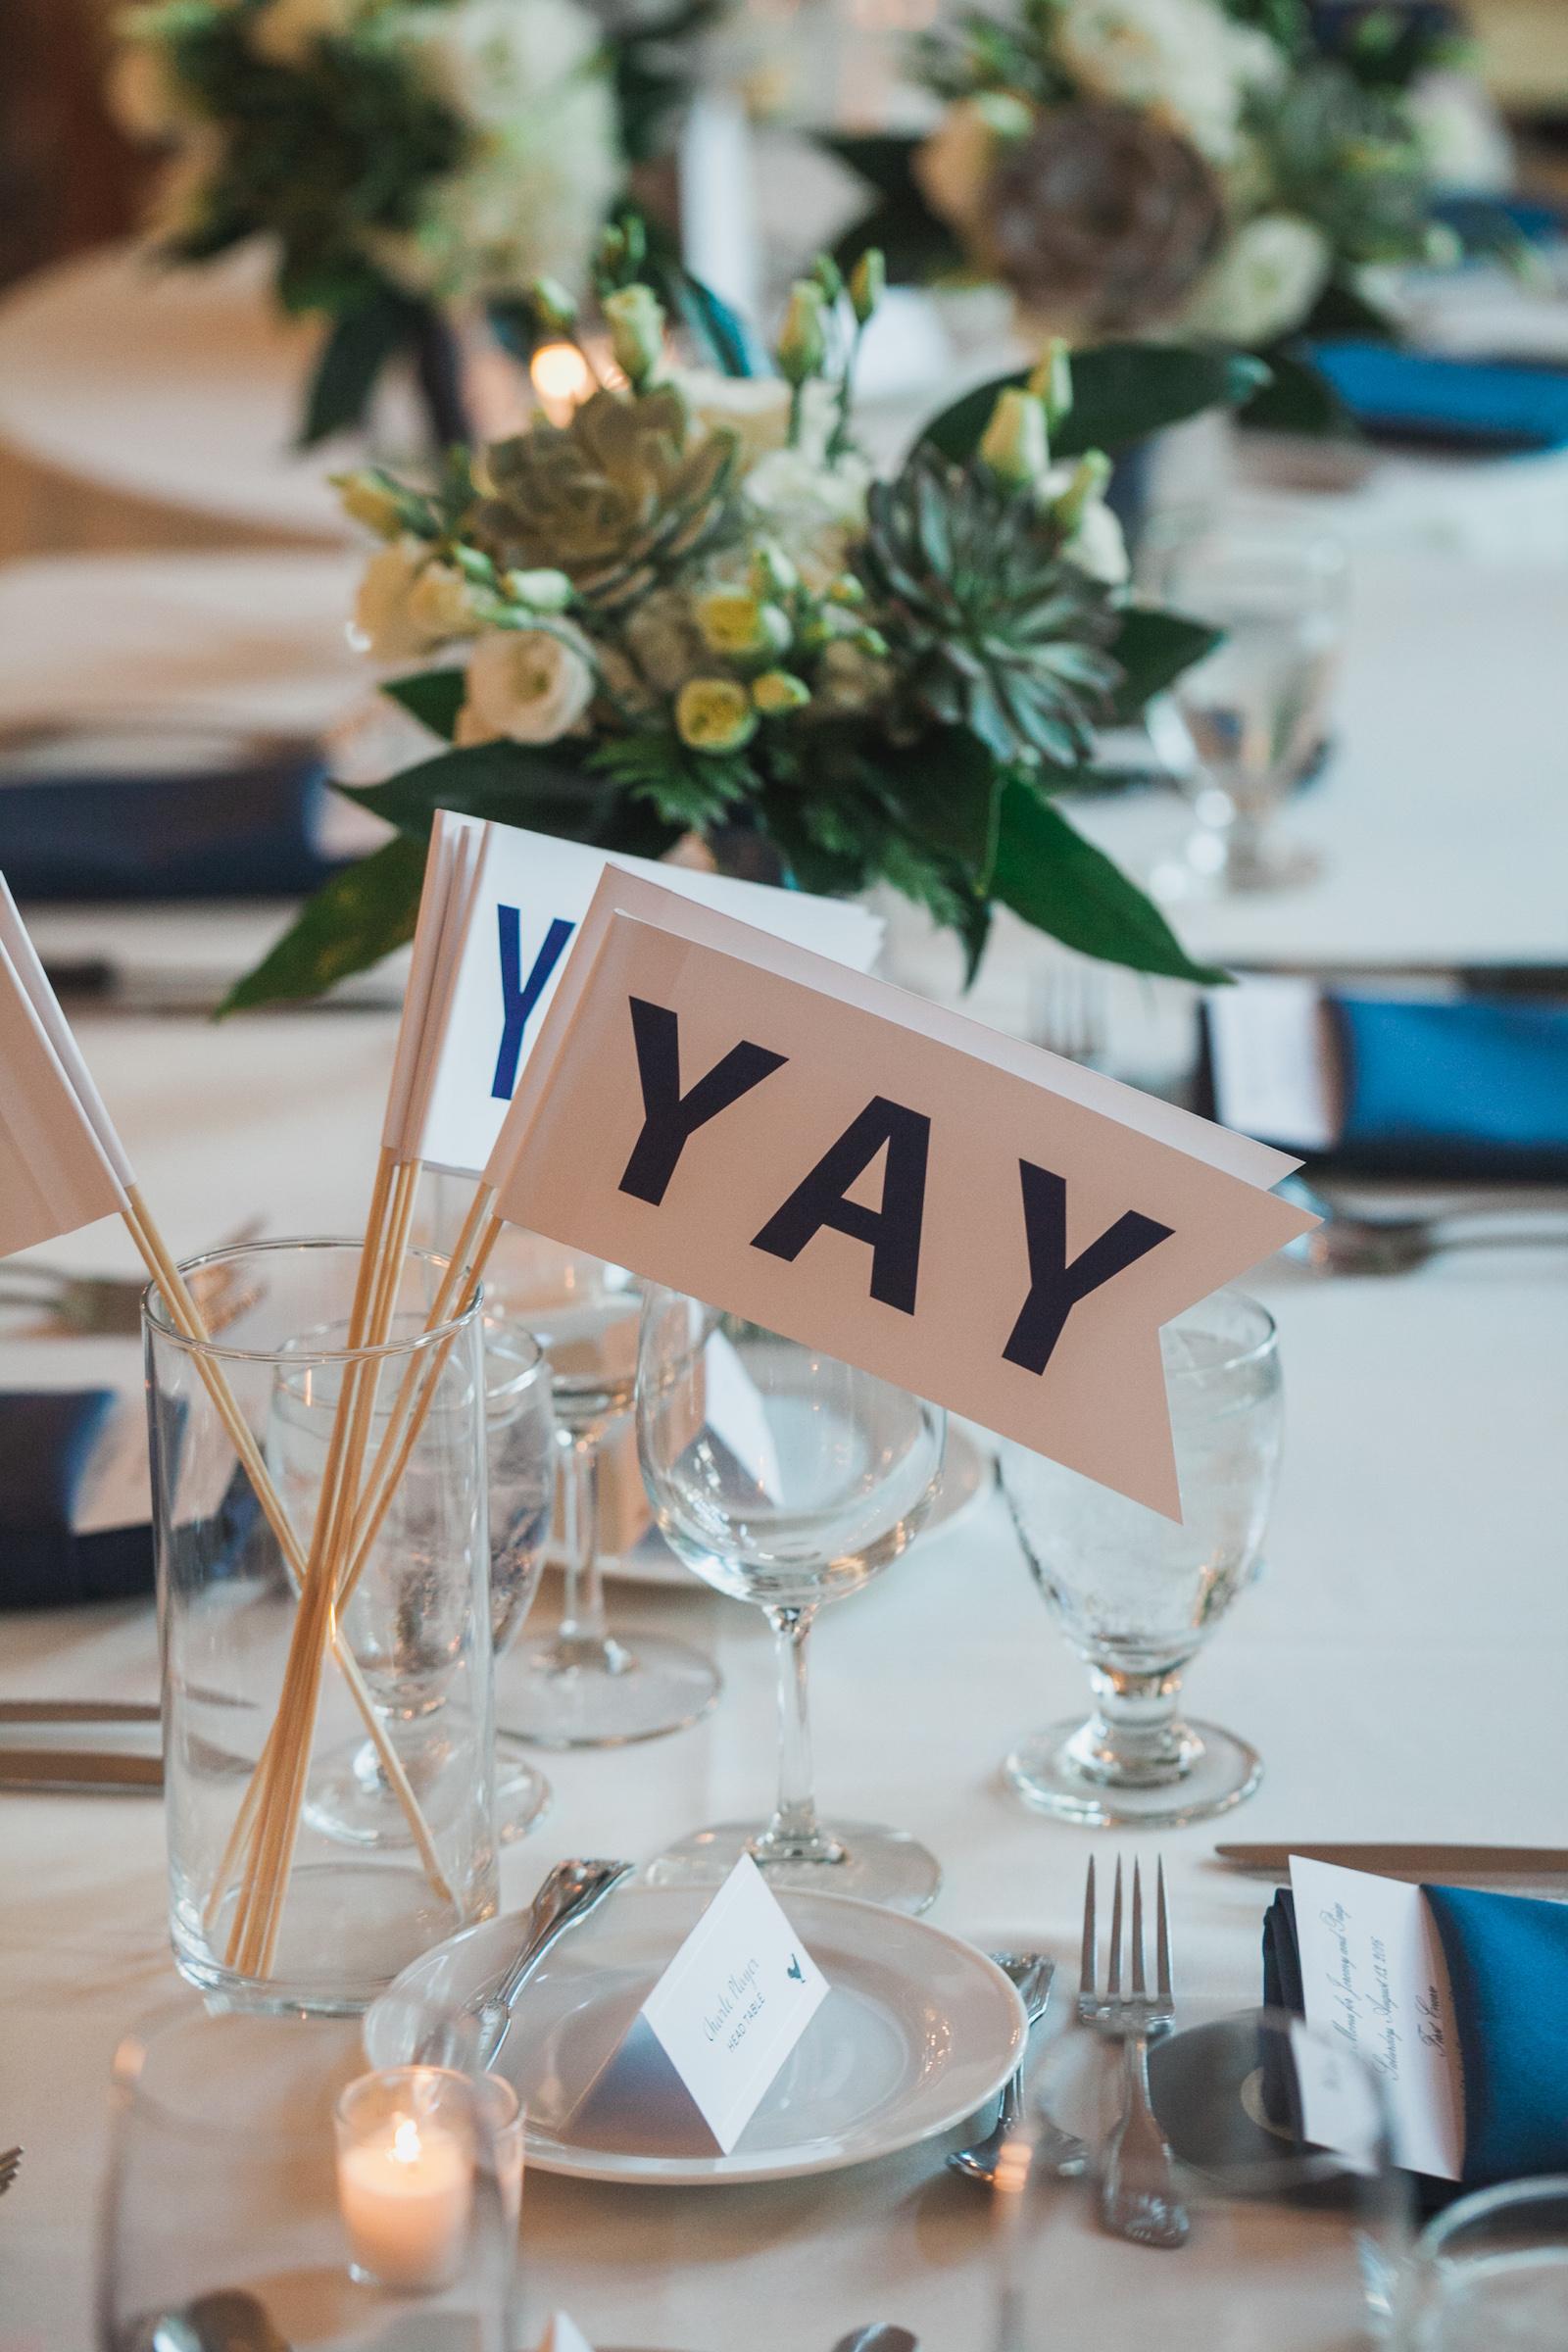 wisconsin-wedding-acowsay-uttke-photography-54.jpg